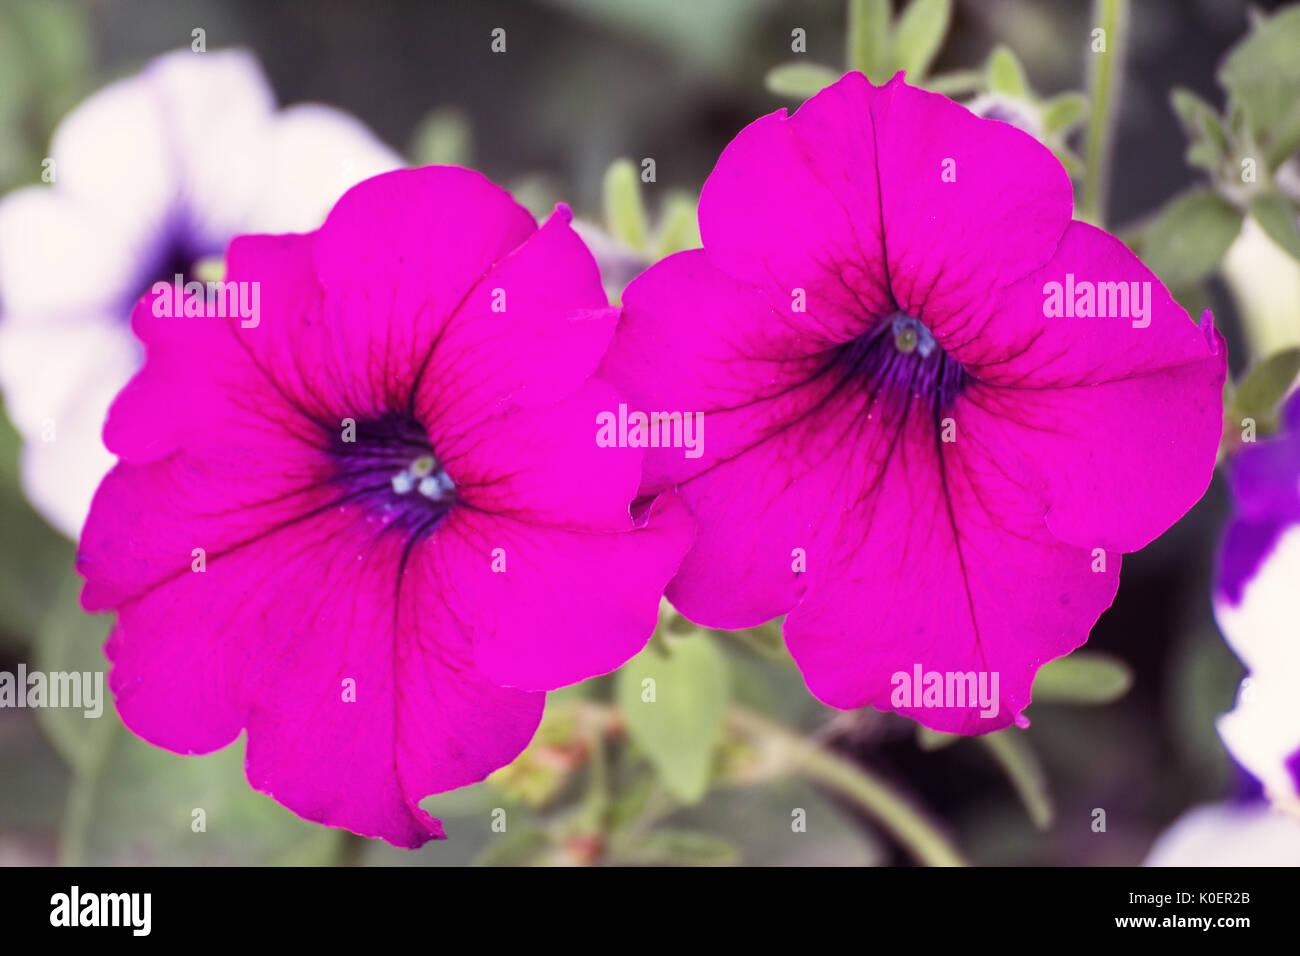 Flowers of pink petunia Stock Photo